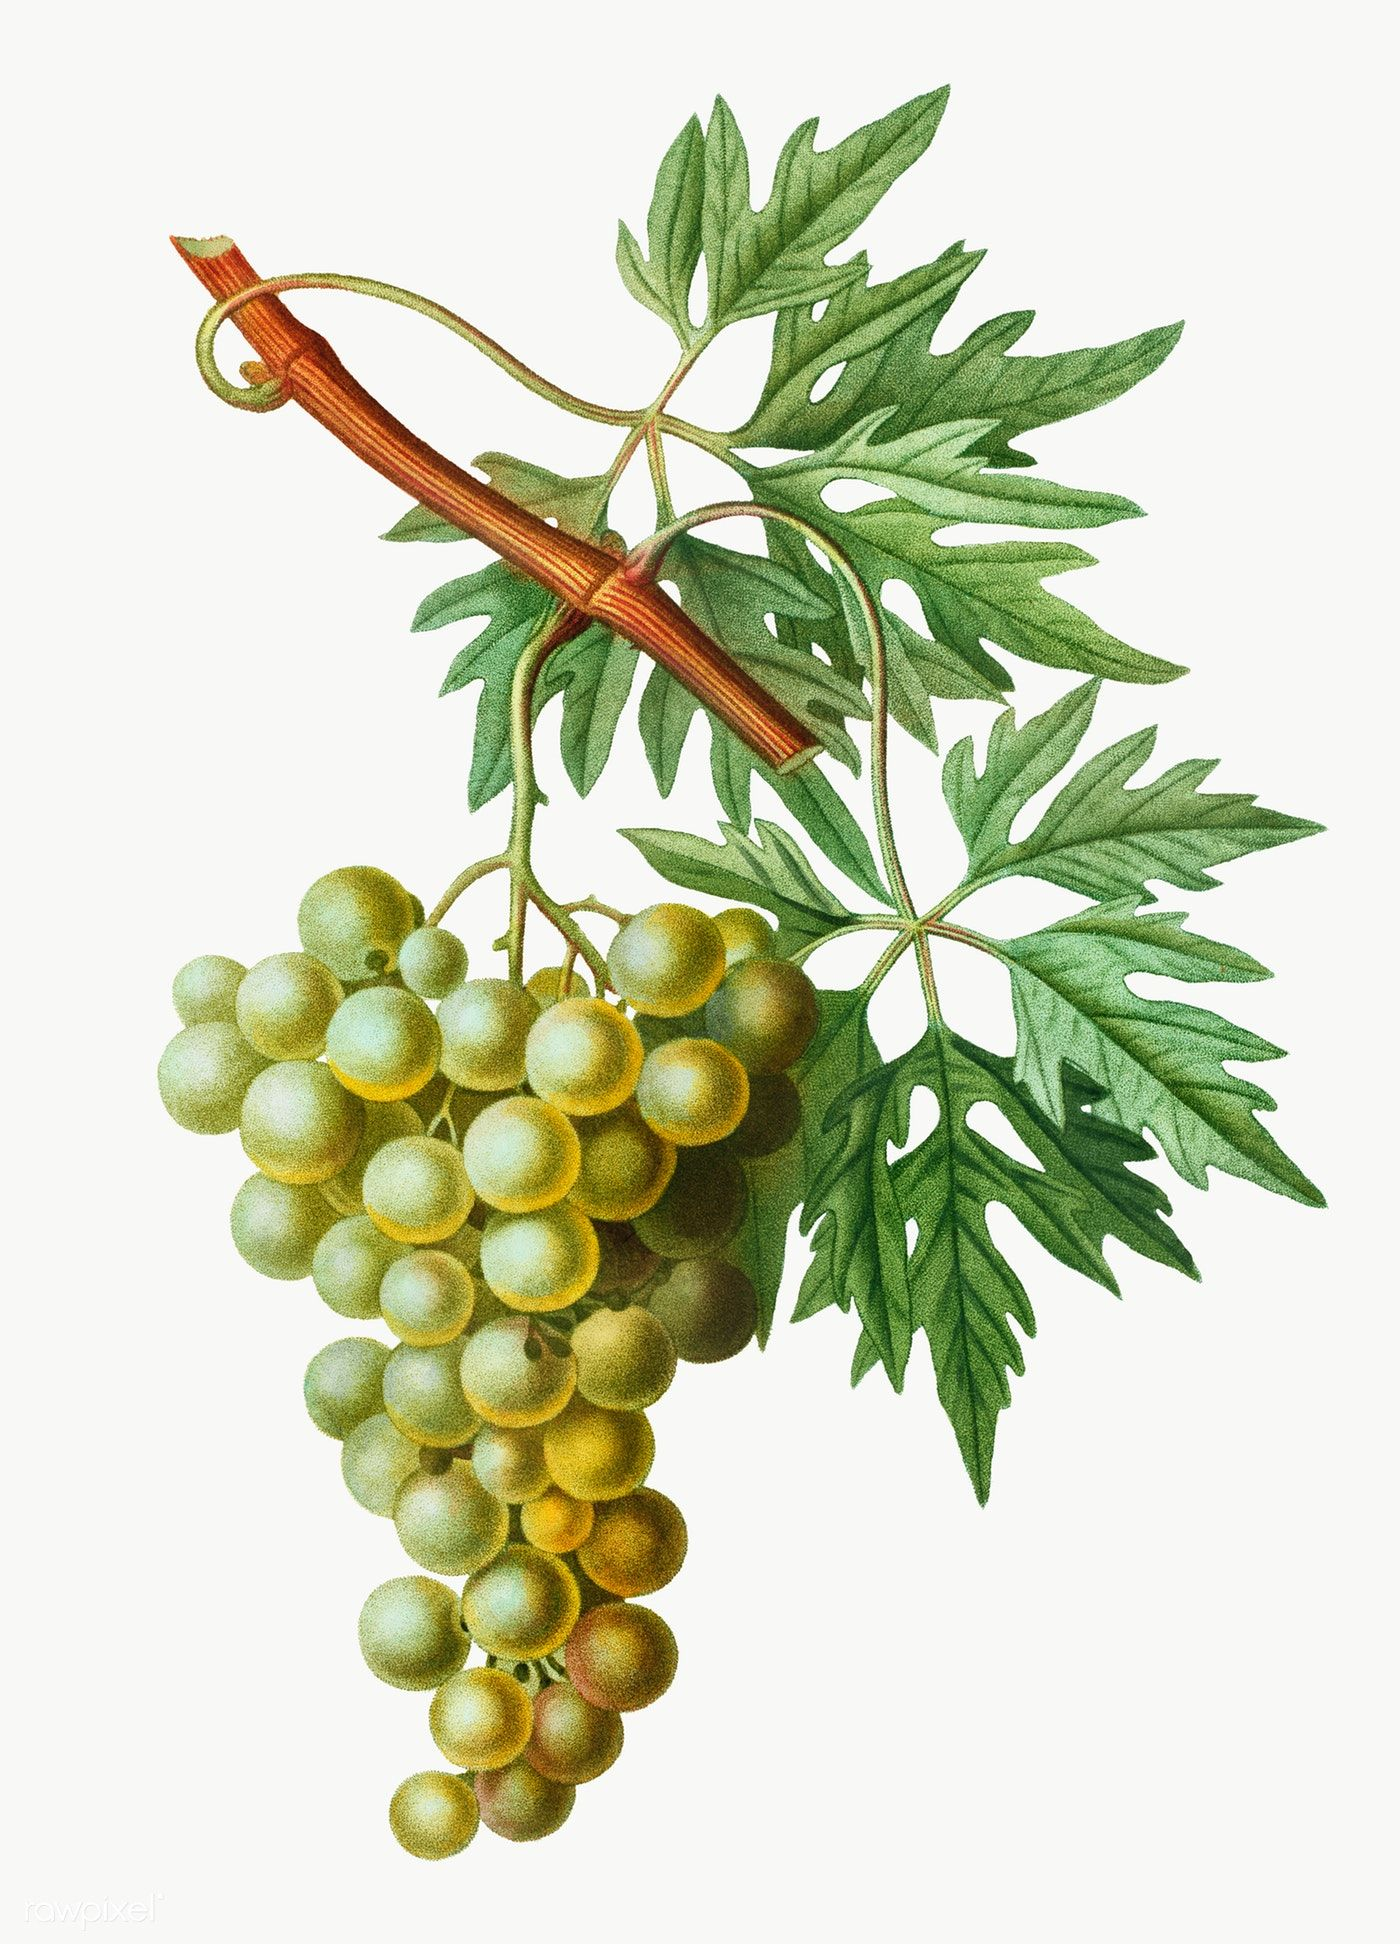 Vintage Grape Vine Branch Transparent Png Free Image By Rawpixel Com Grapes Green Grapes Grape Vines